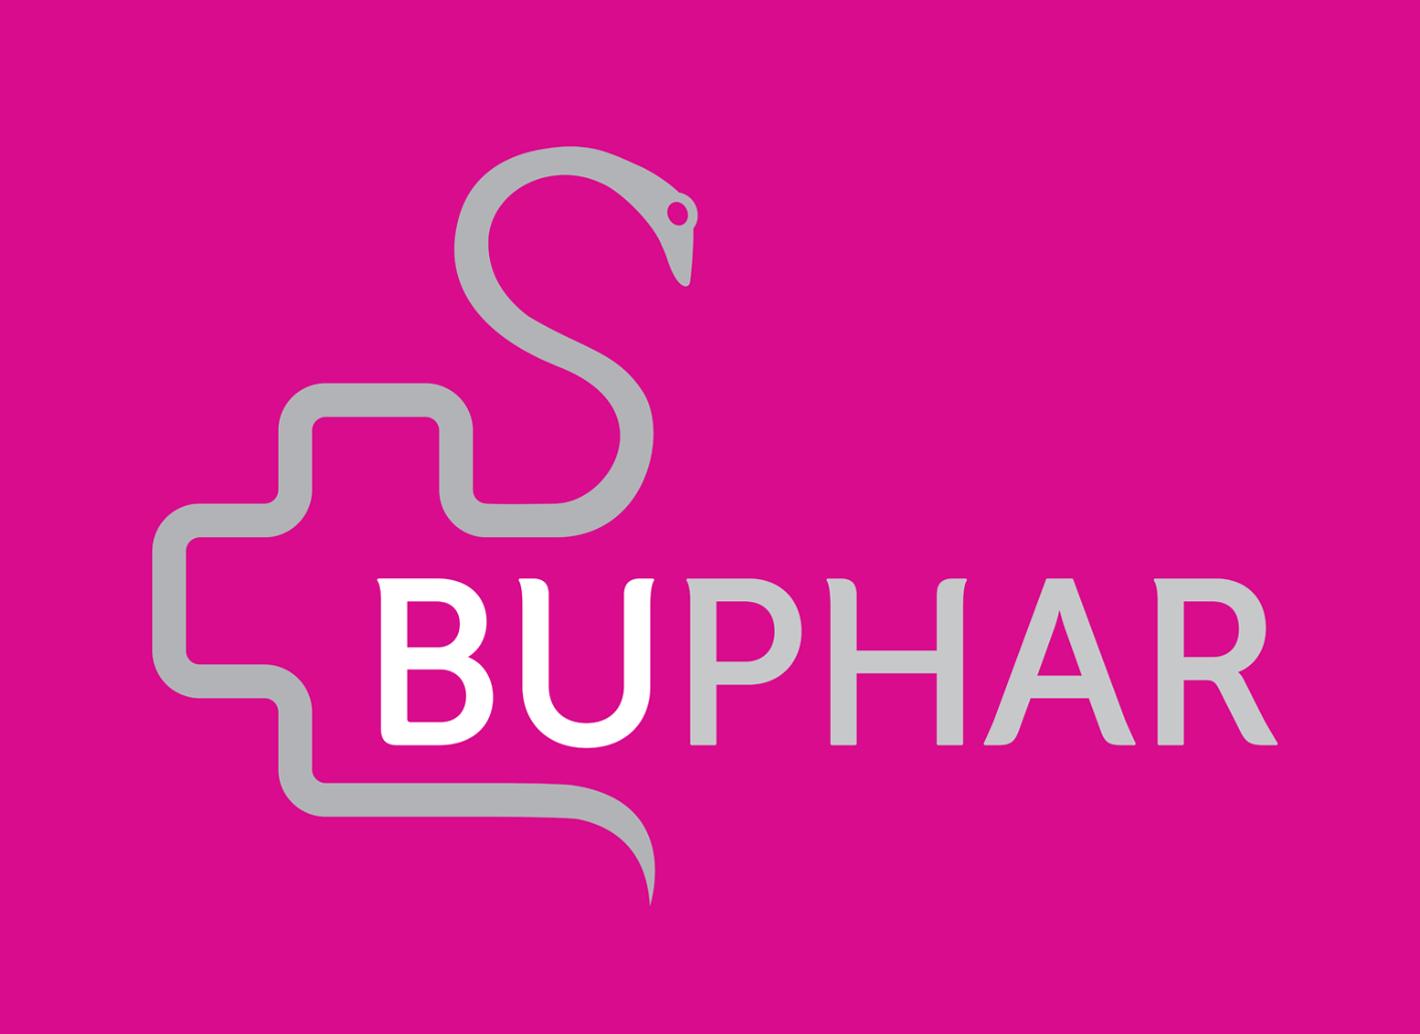 Apotheek logo Buphar Oelegem fuchsia slang